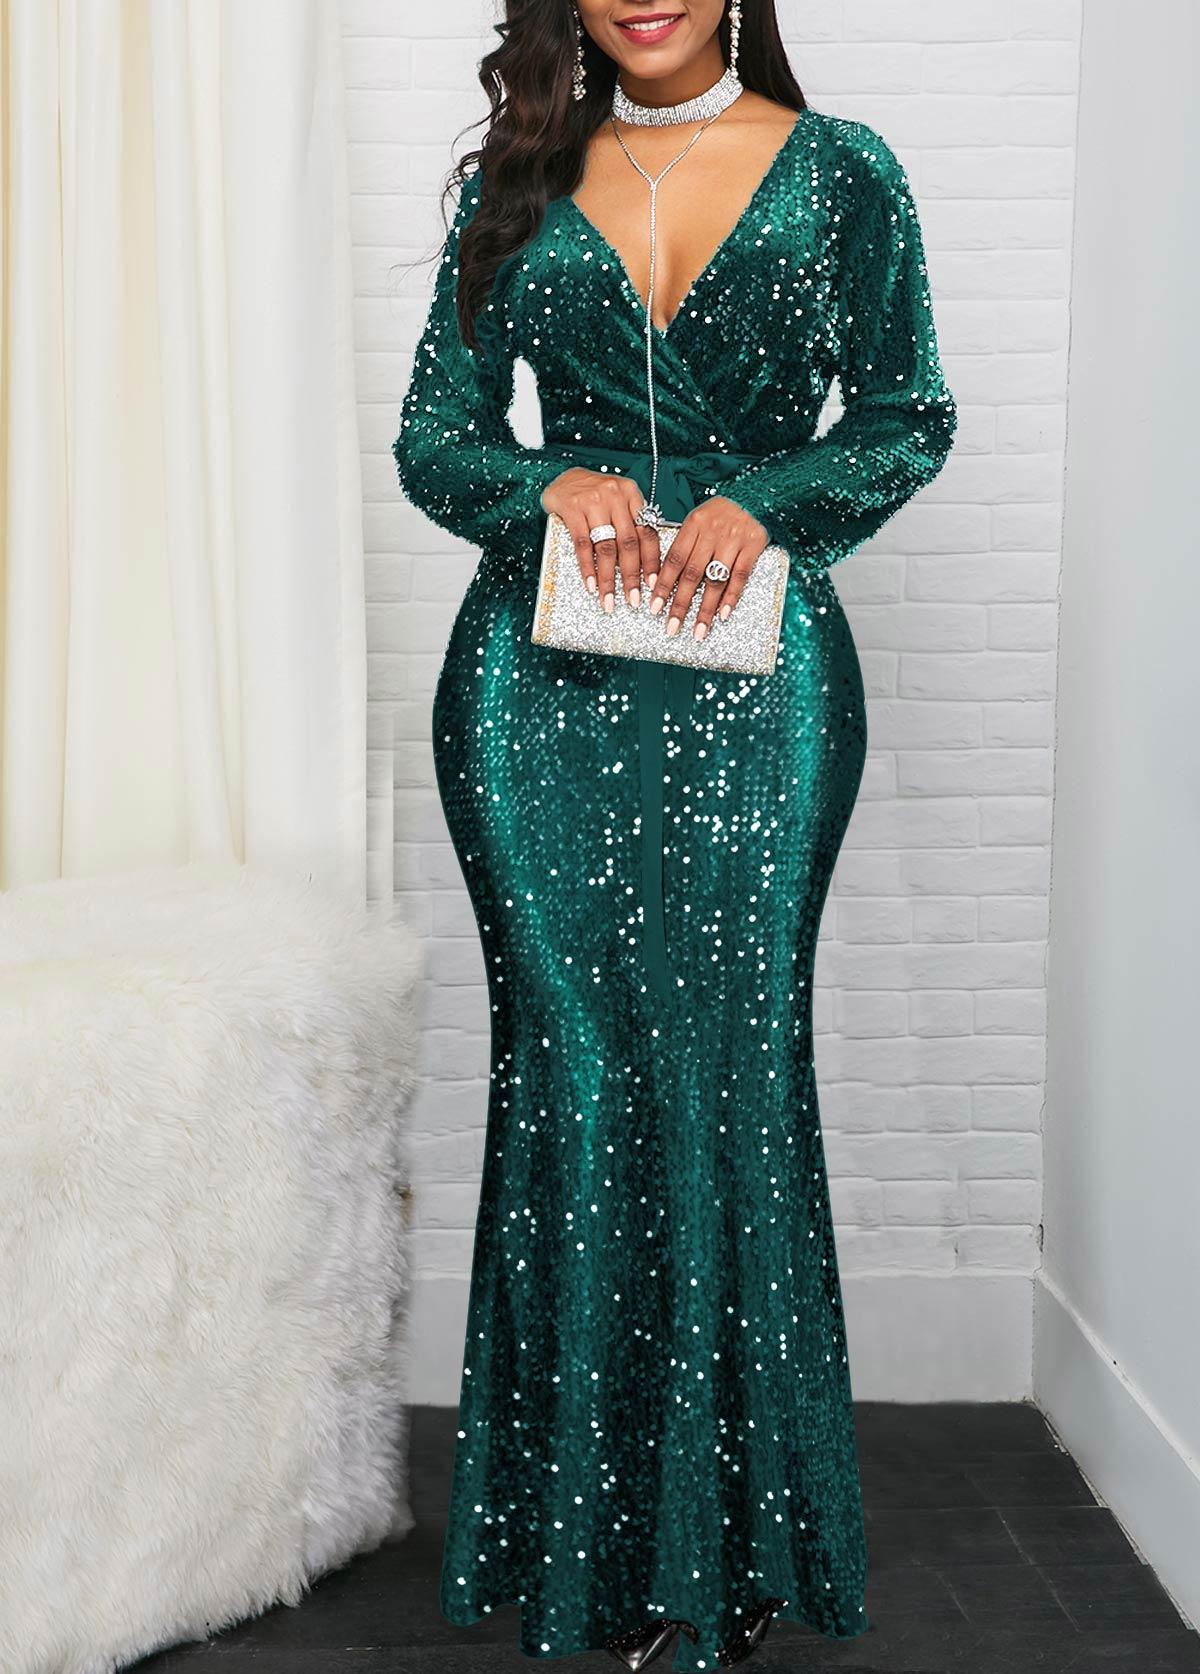 Ruffle Hem Plunging Neck Sequin Embellished Dress